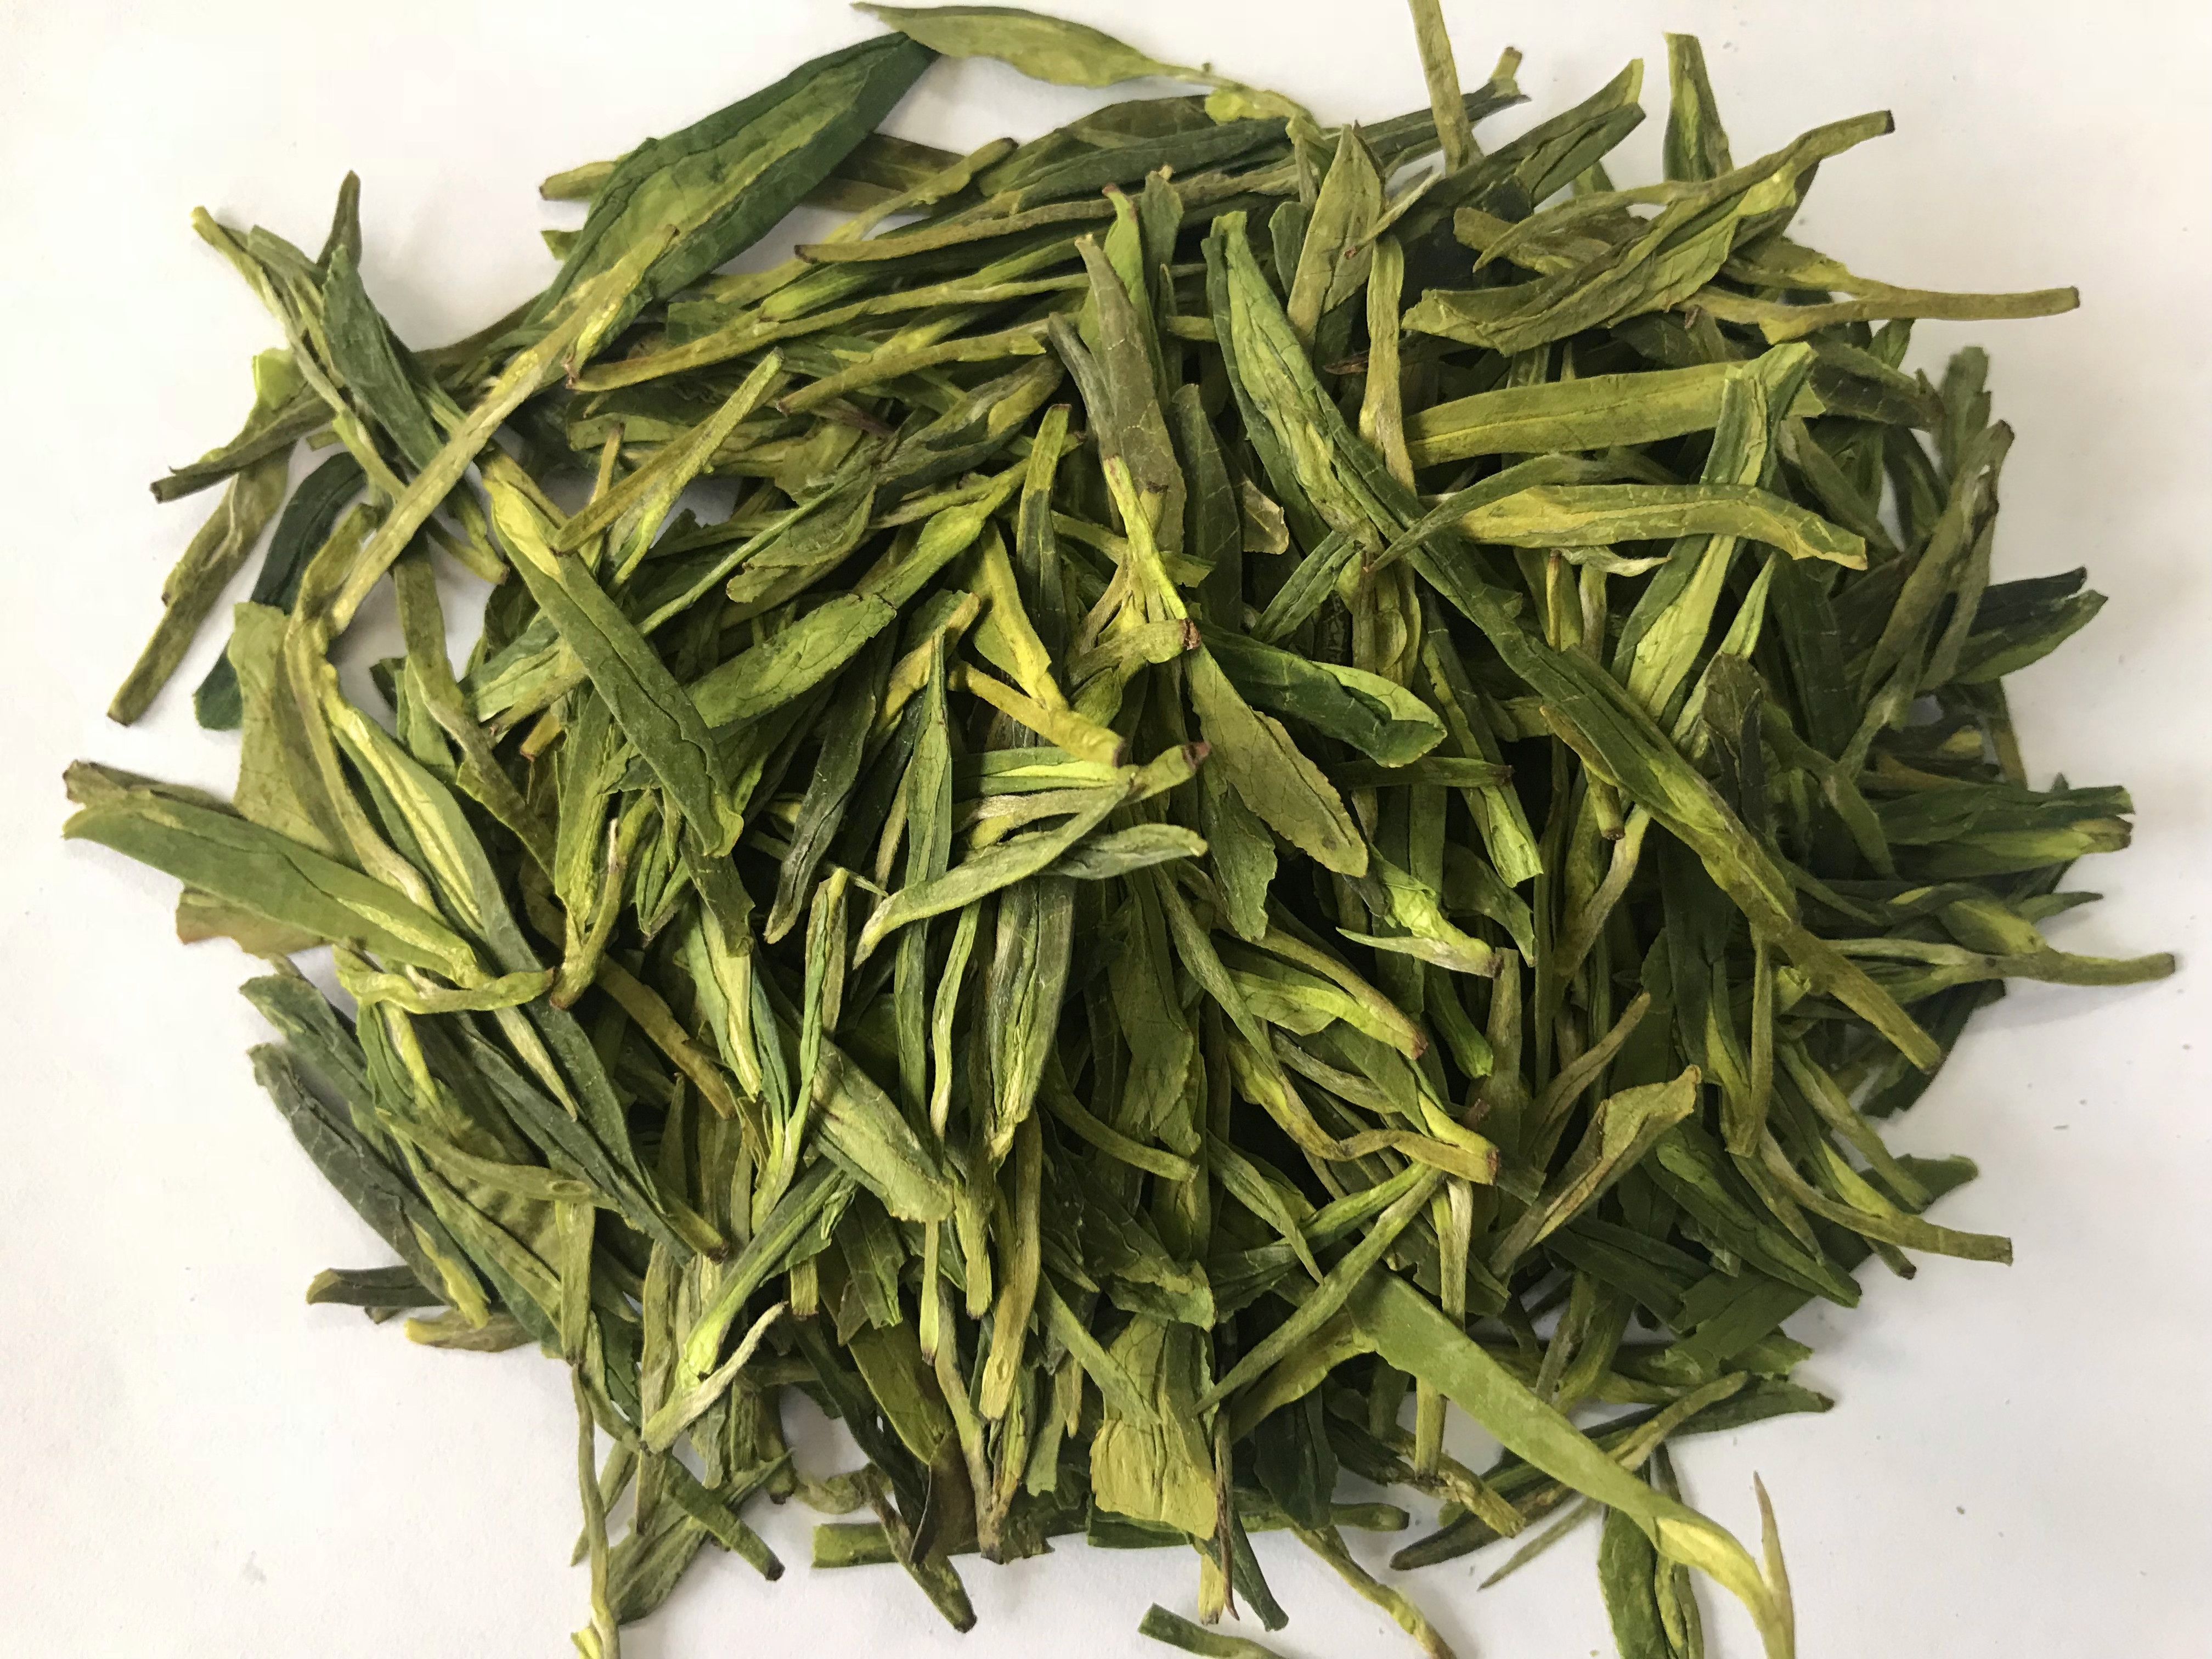 2019 New Early Spring Harvest Xihu Longjing Green Tea Price Per kg - 4uTea | 4uTea.com